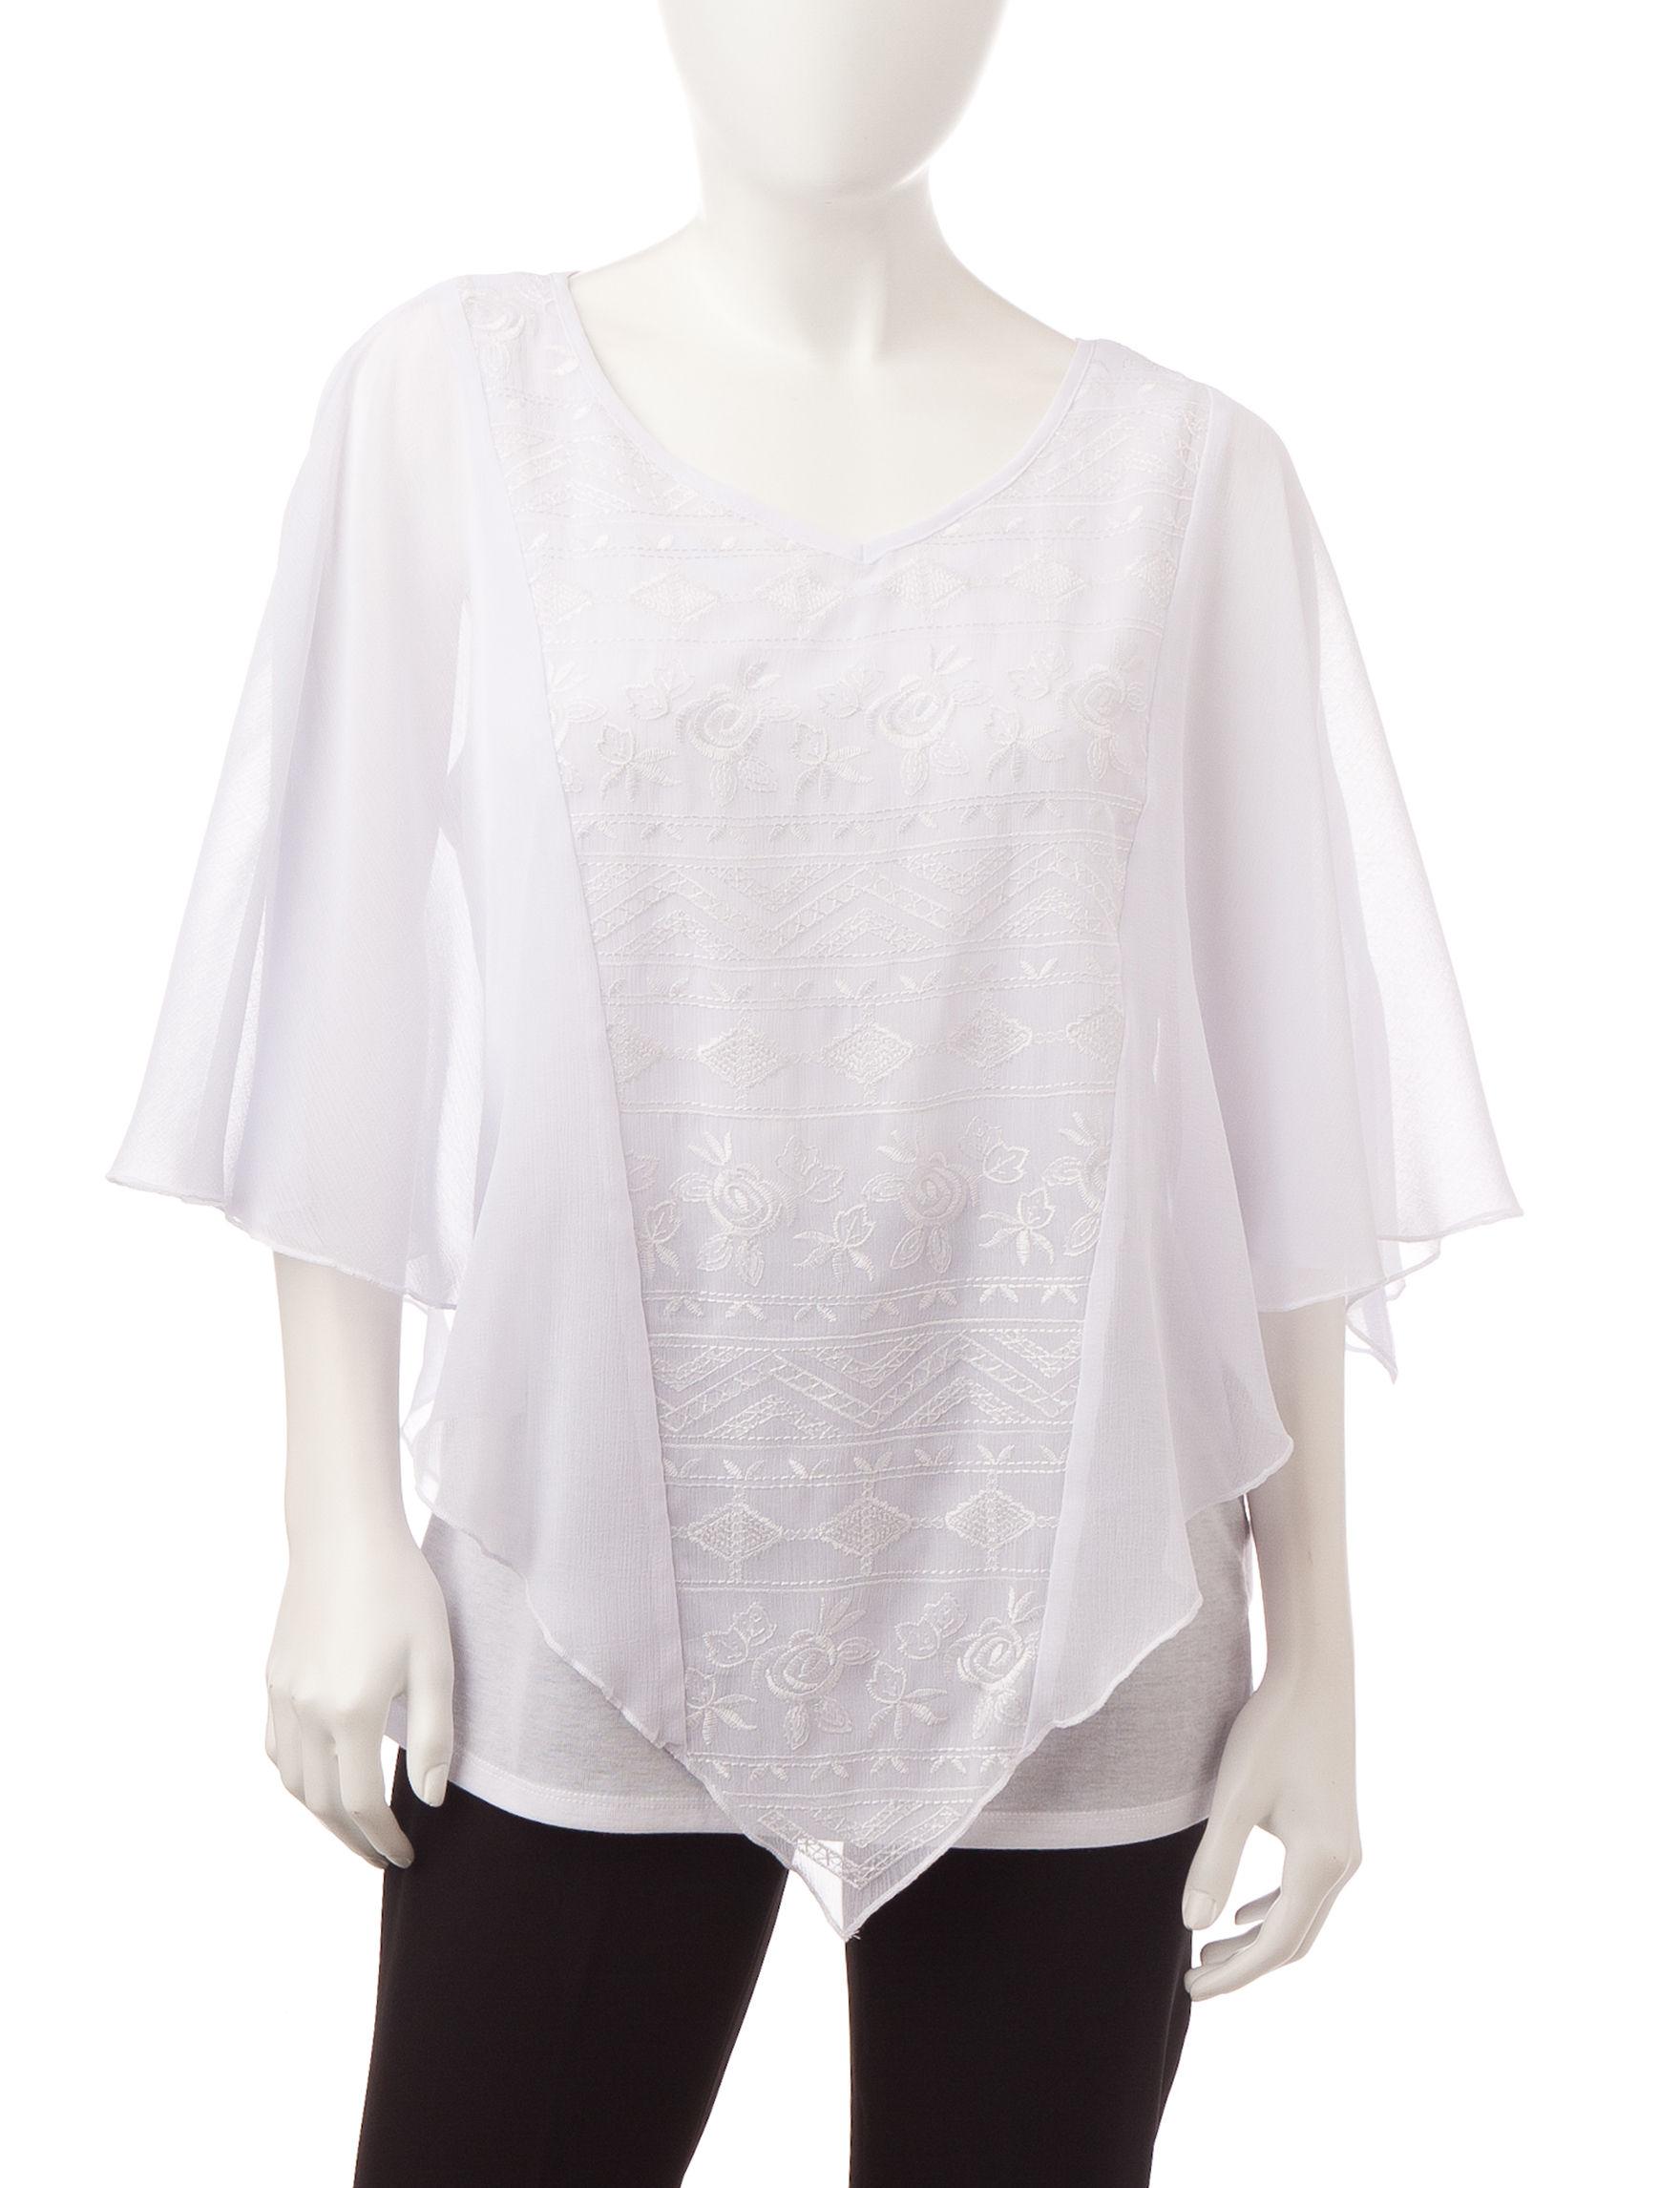 Energe White Shirts & Blouses